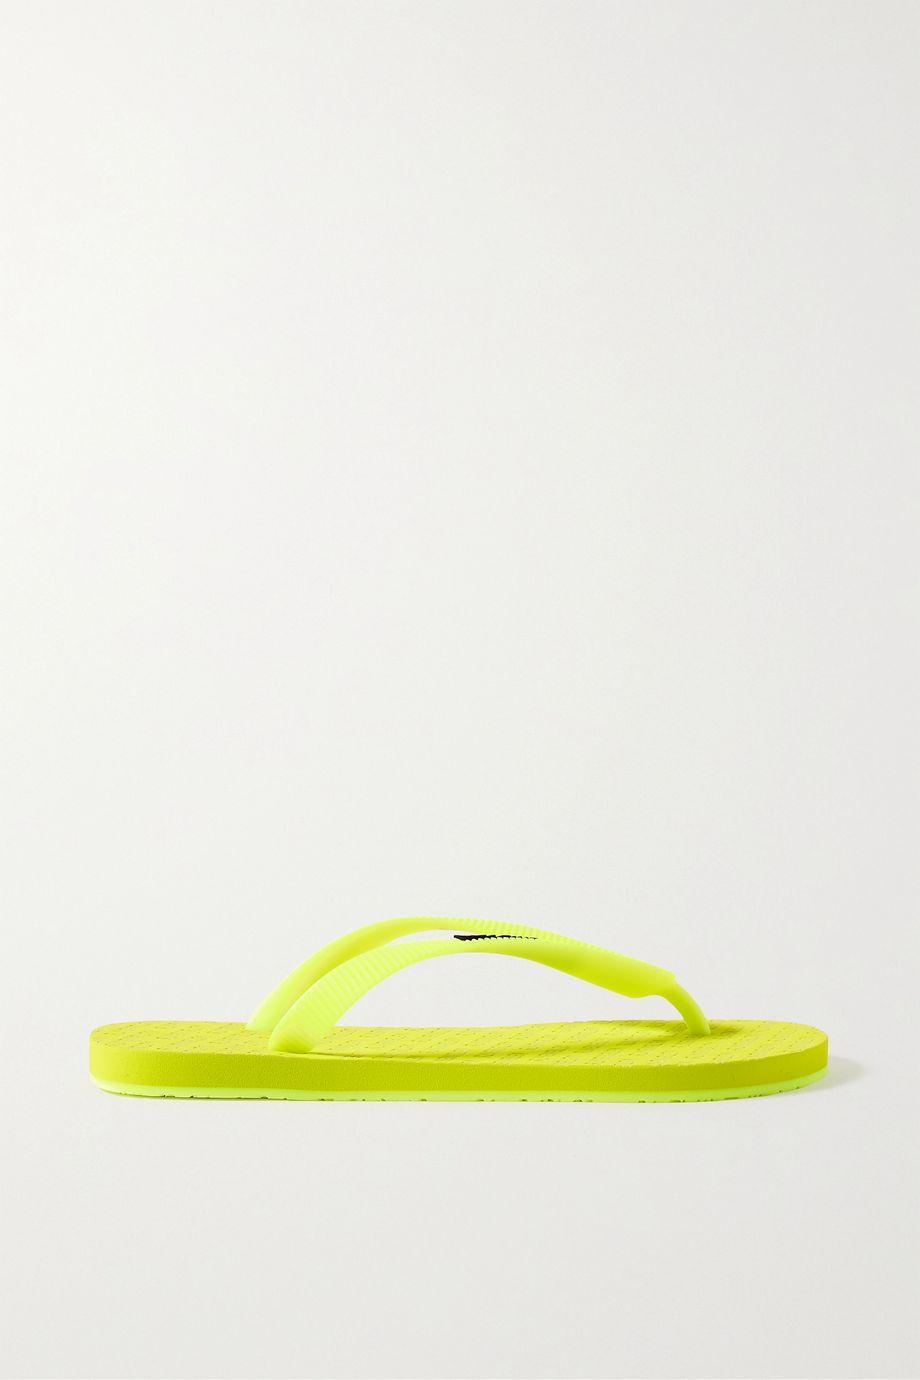 Vetements Logo-embellished neon rubber flip flops